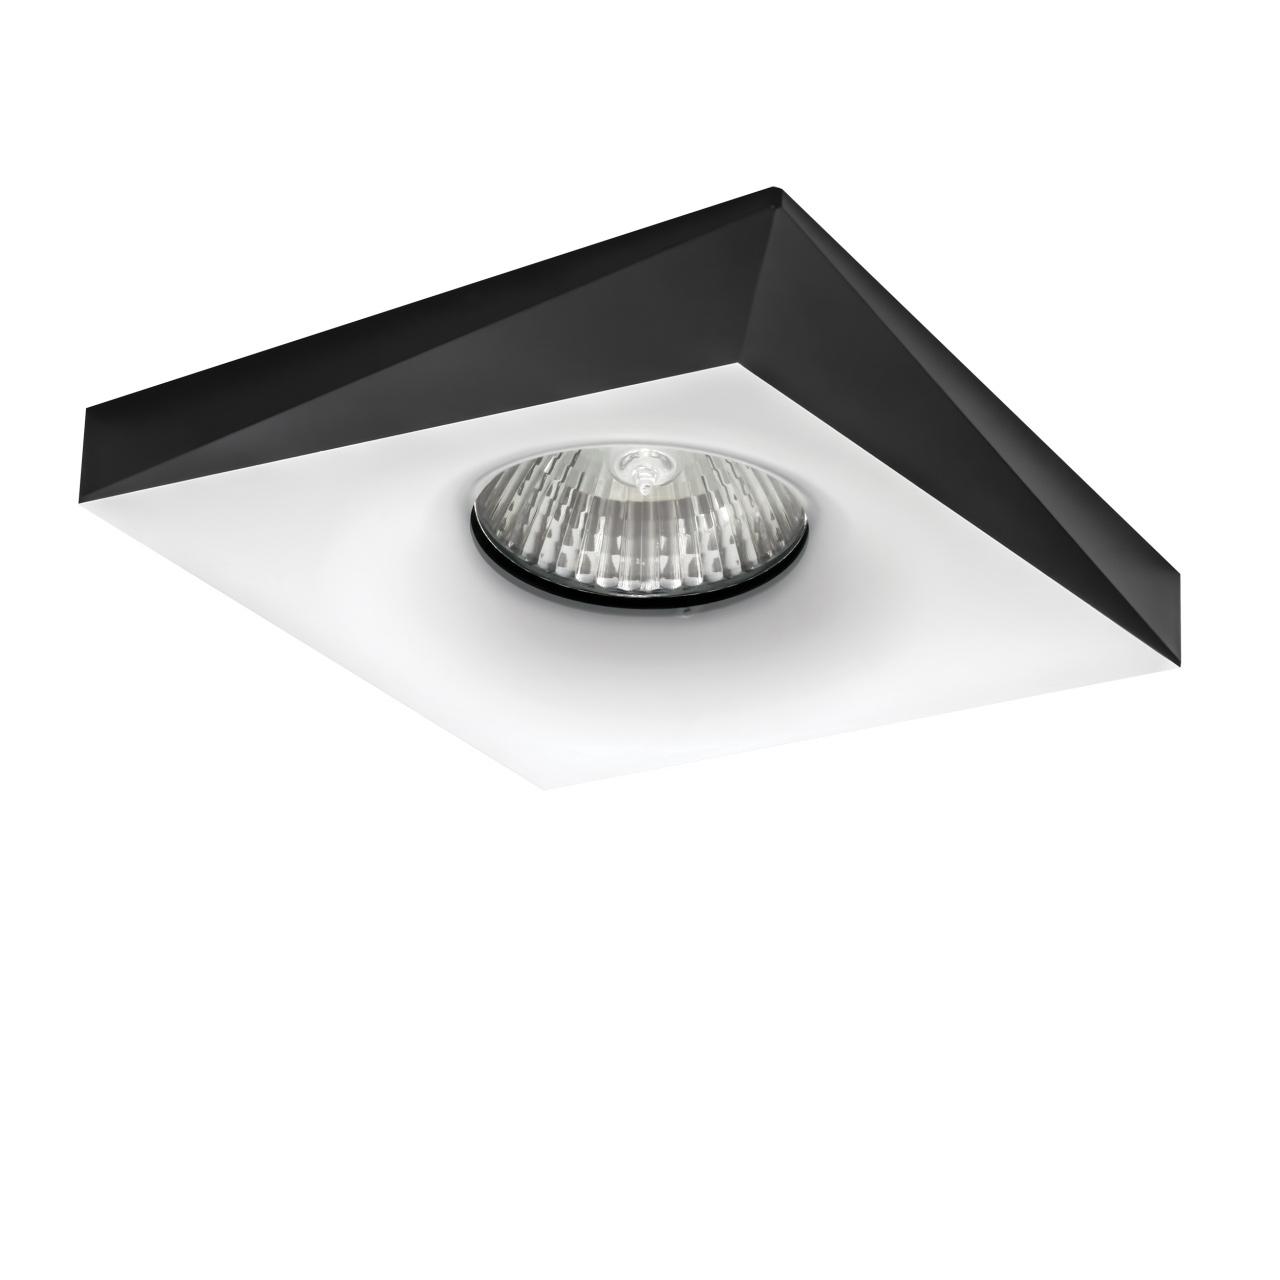 Светильник Miriade MR16 / HP16 белый+черный Lightstar 011006